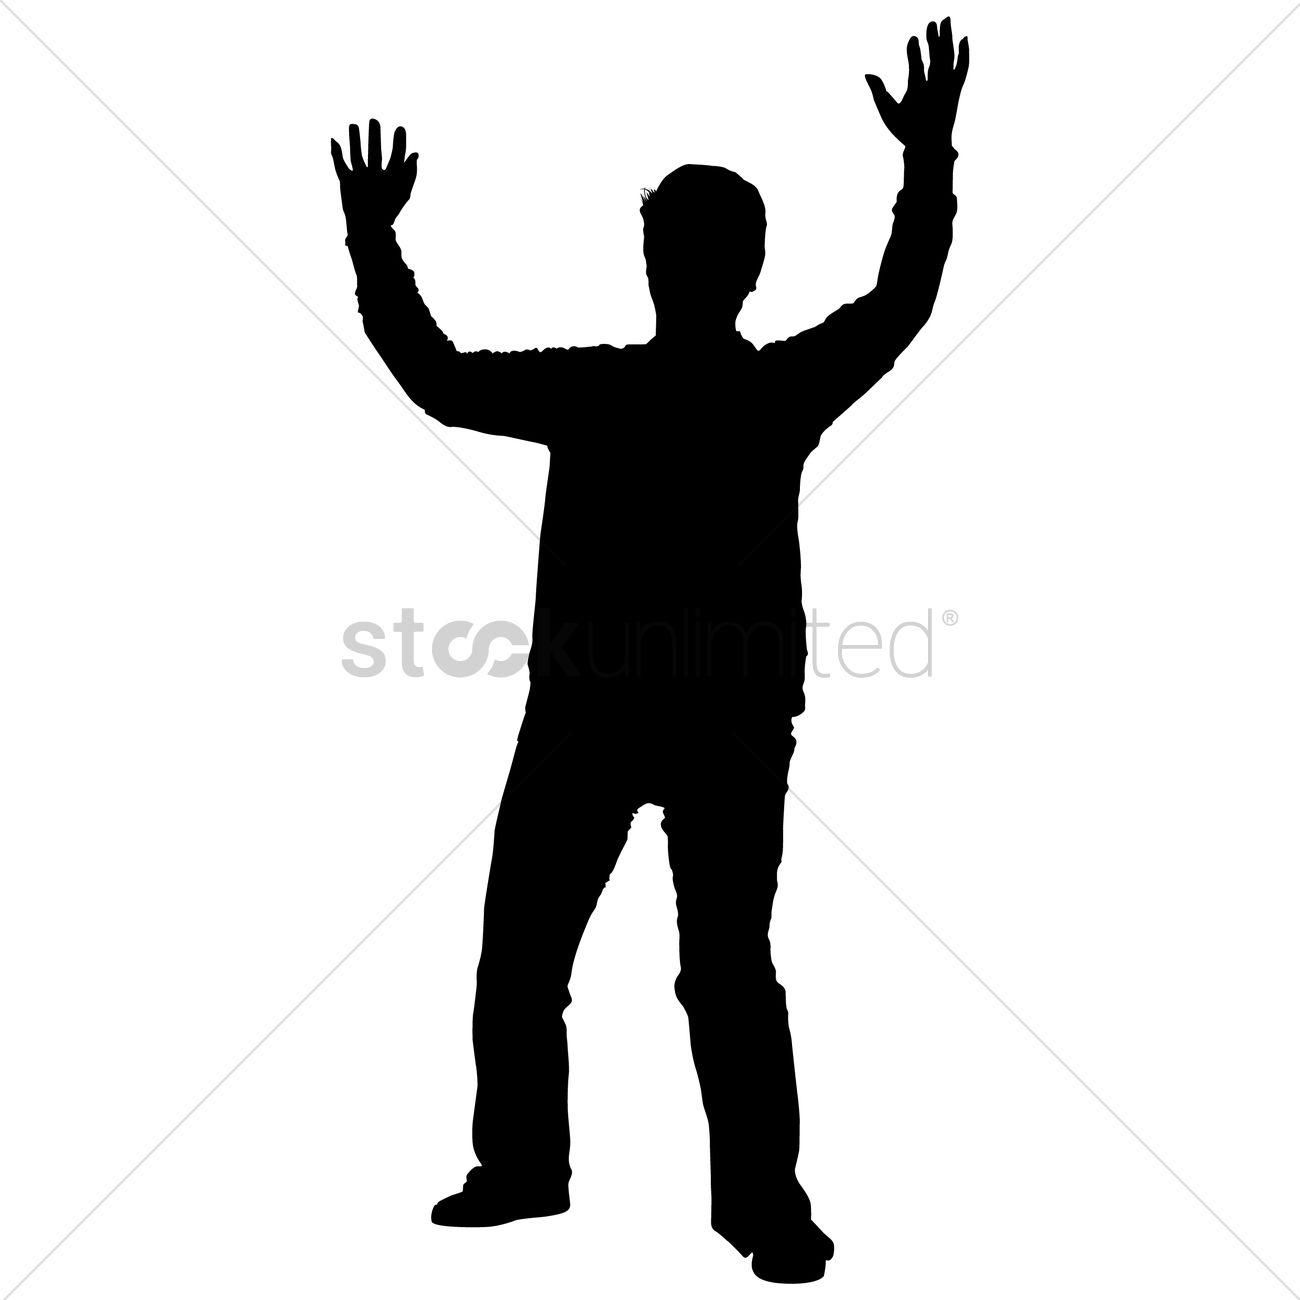 1300x1300 Raising Hands Silhouette Clipart